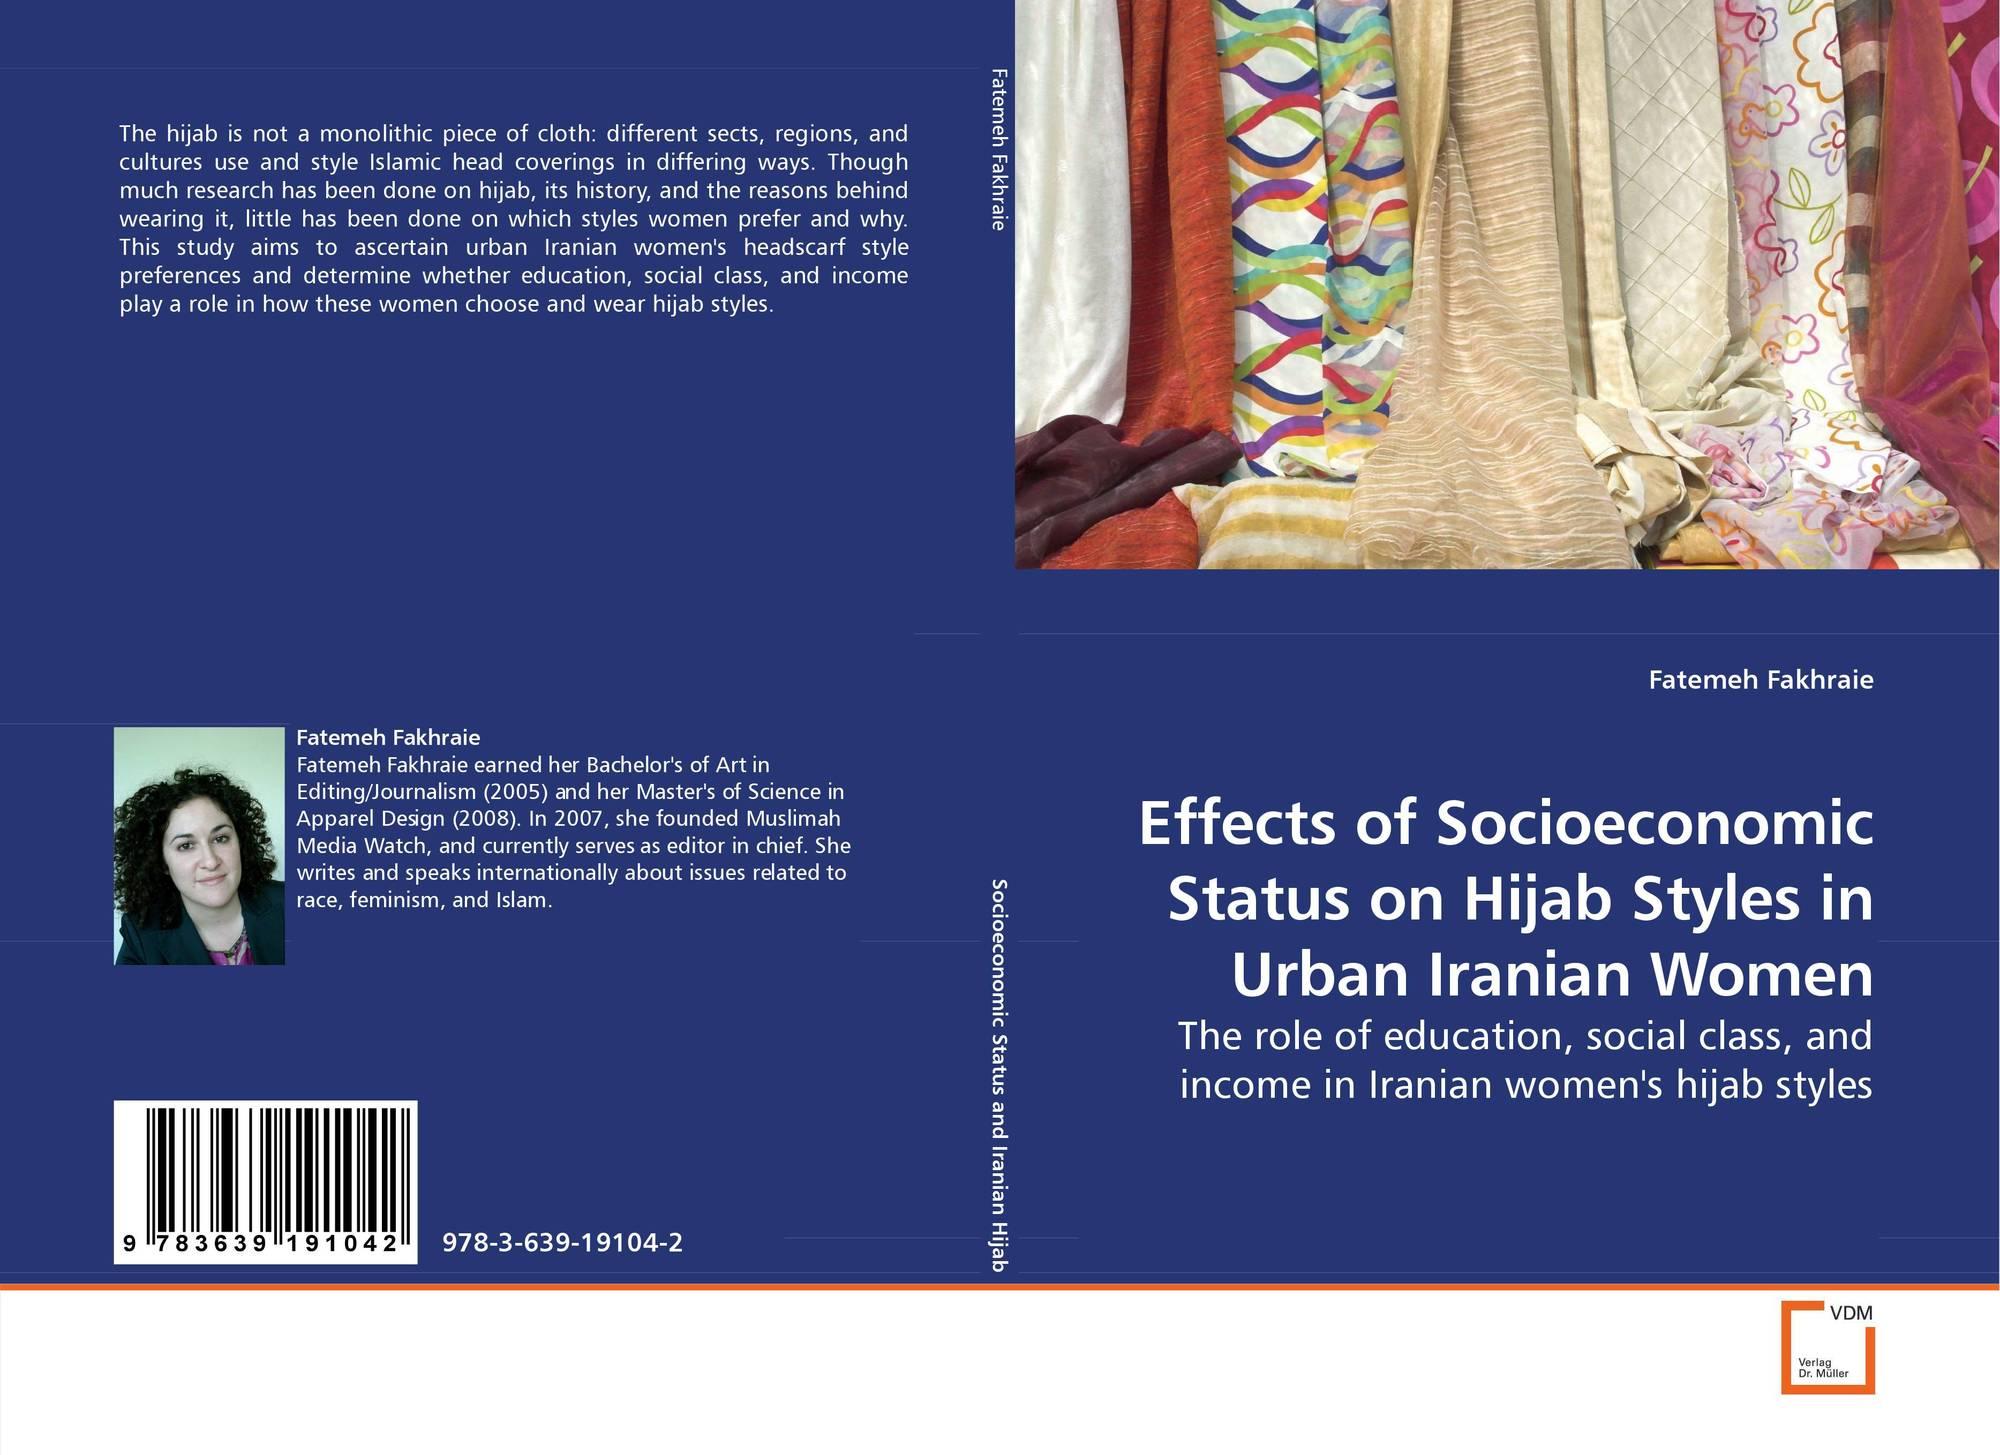 Effects of Socioeconomic Status on Hijab Styles in Urban